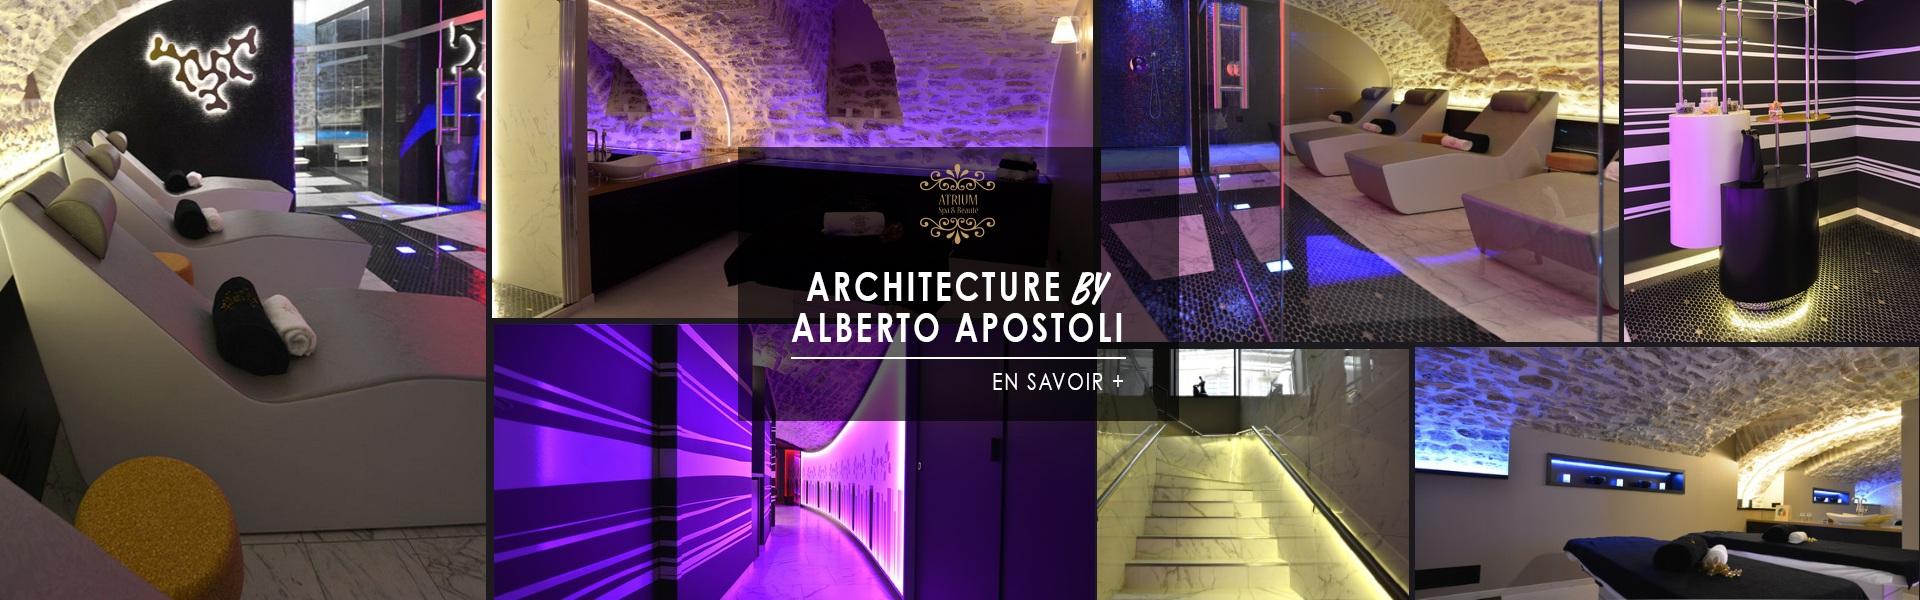 Architecture by Alberto Apostoli